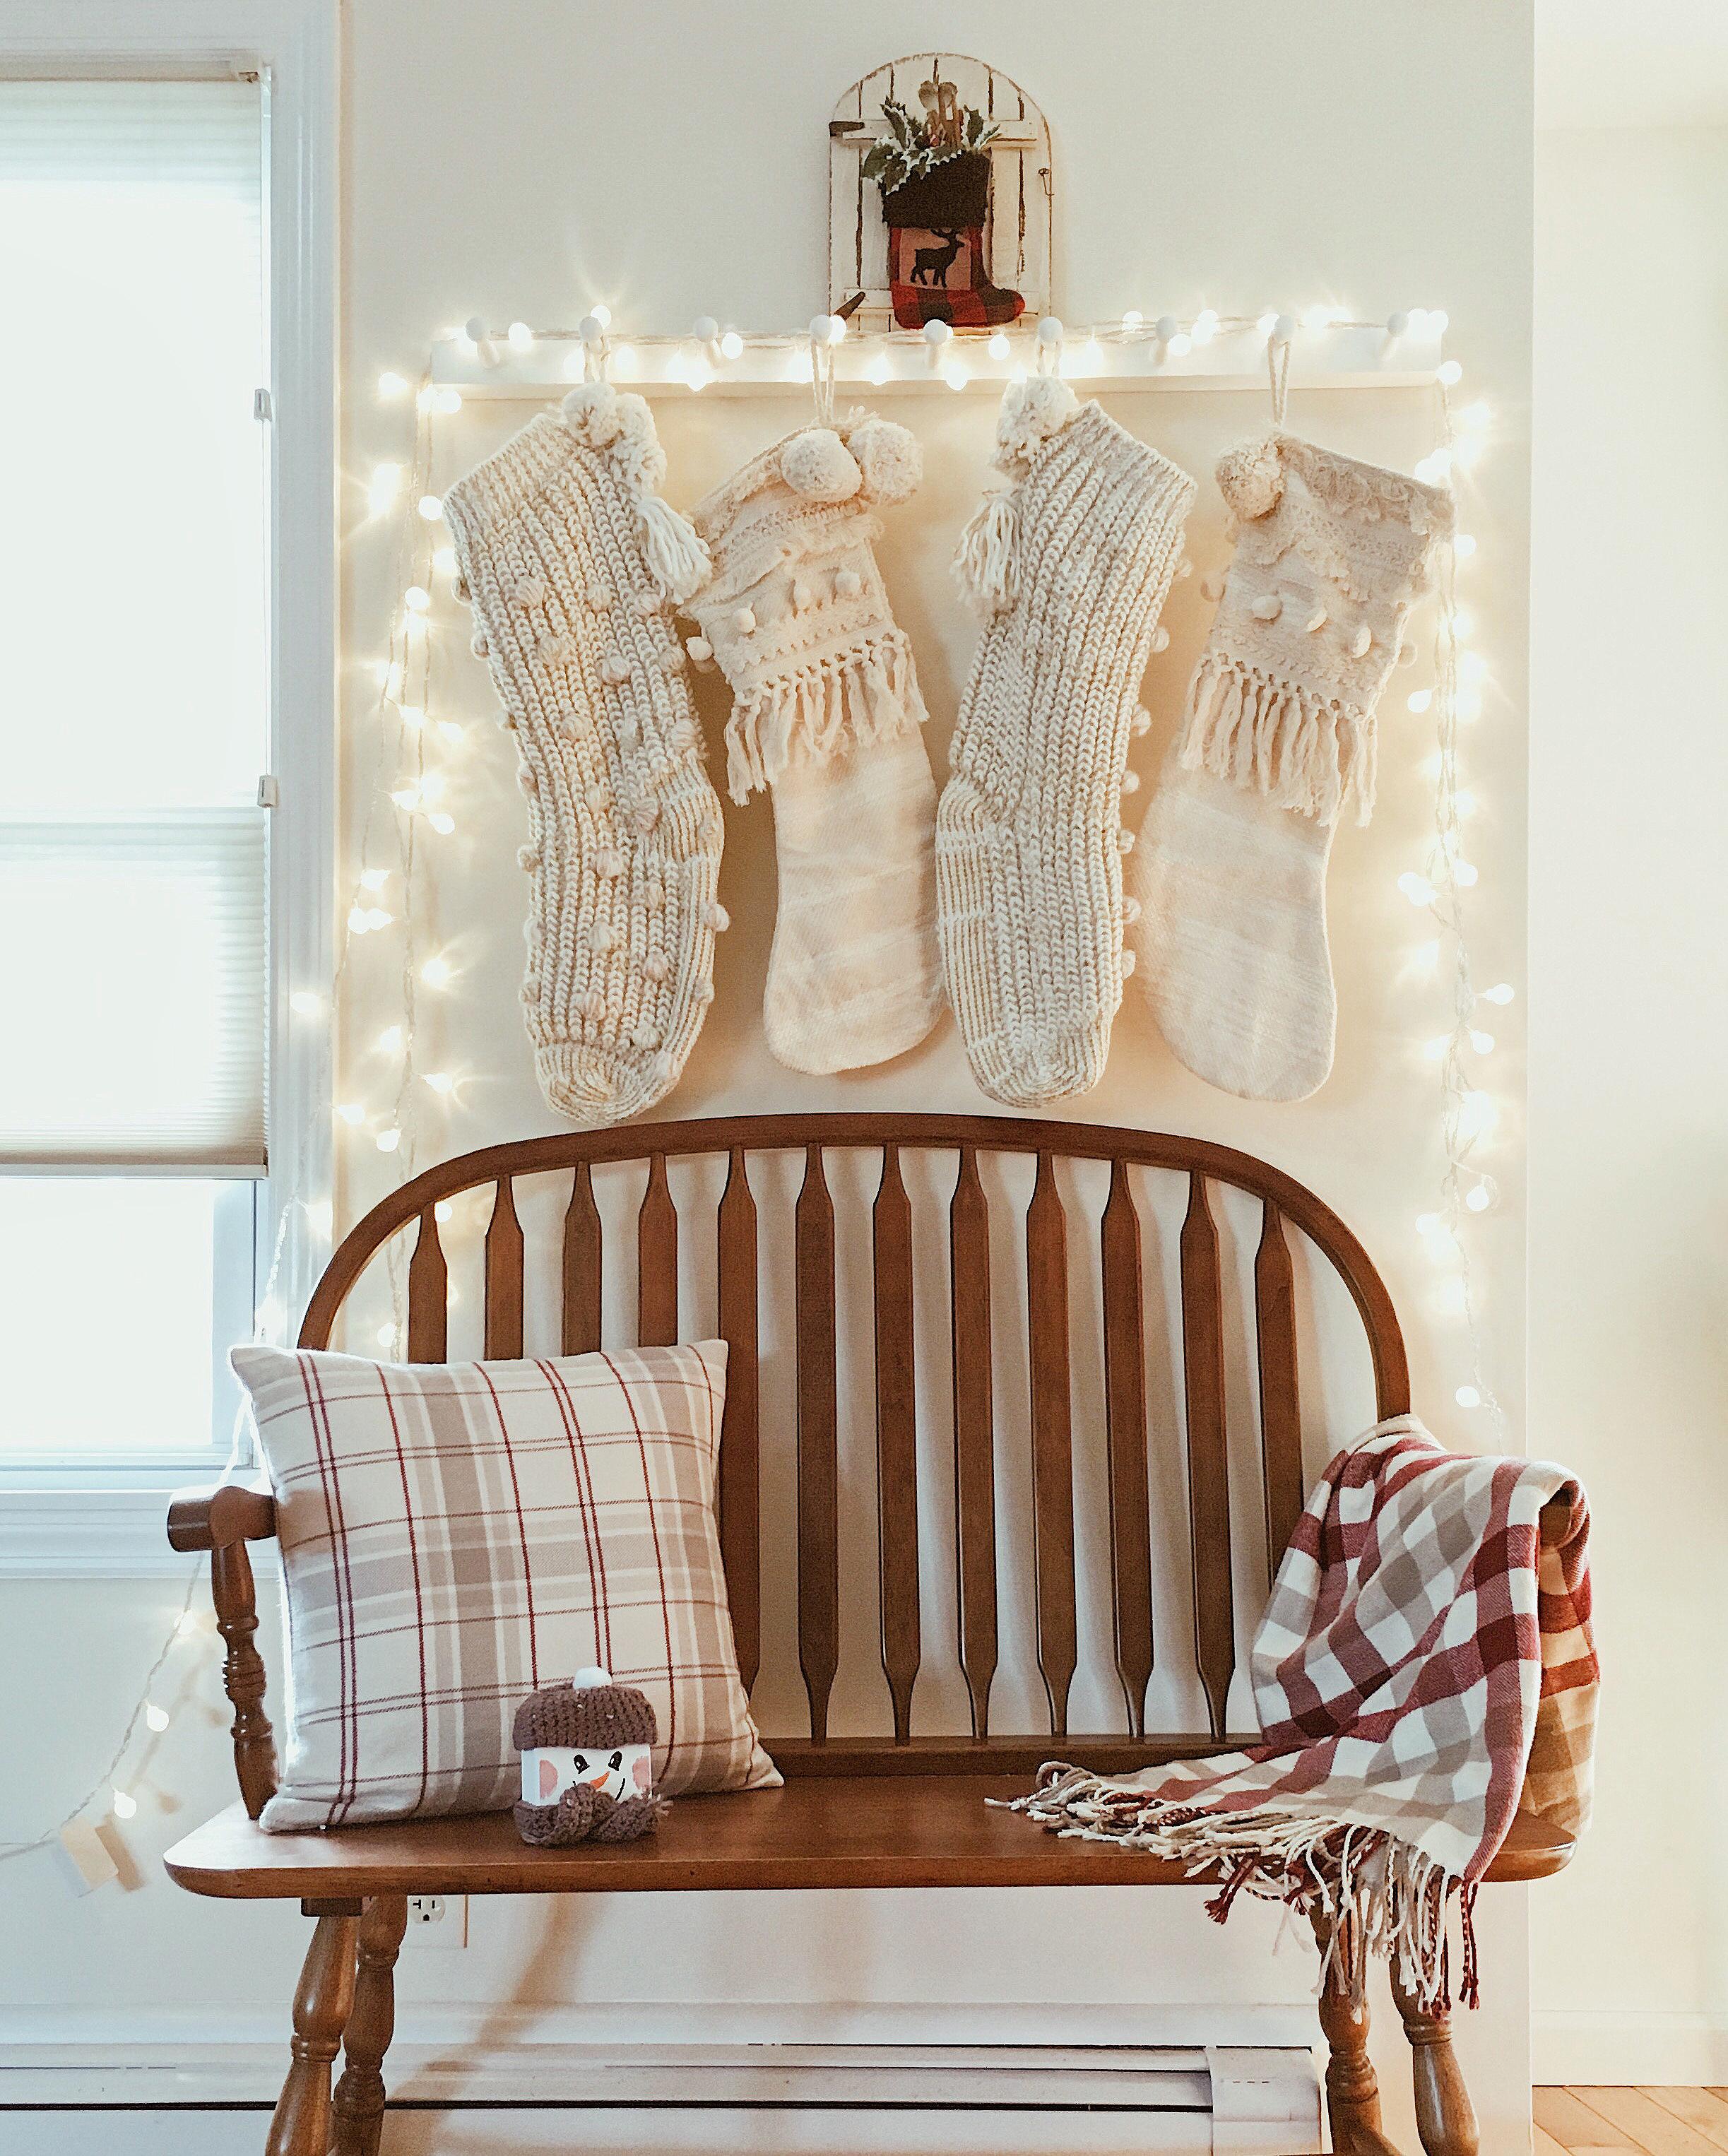 Merry & Bright // livelovesimple.com